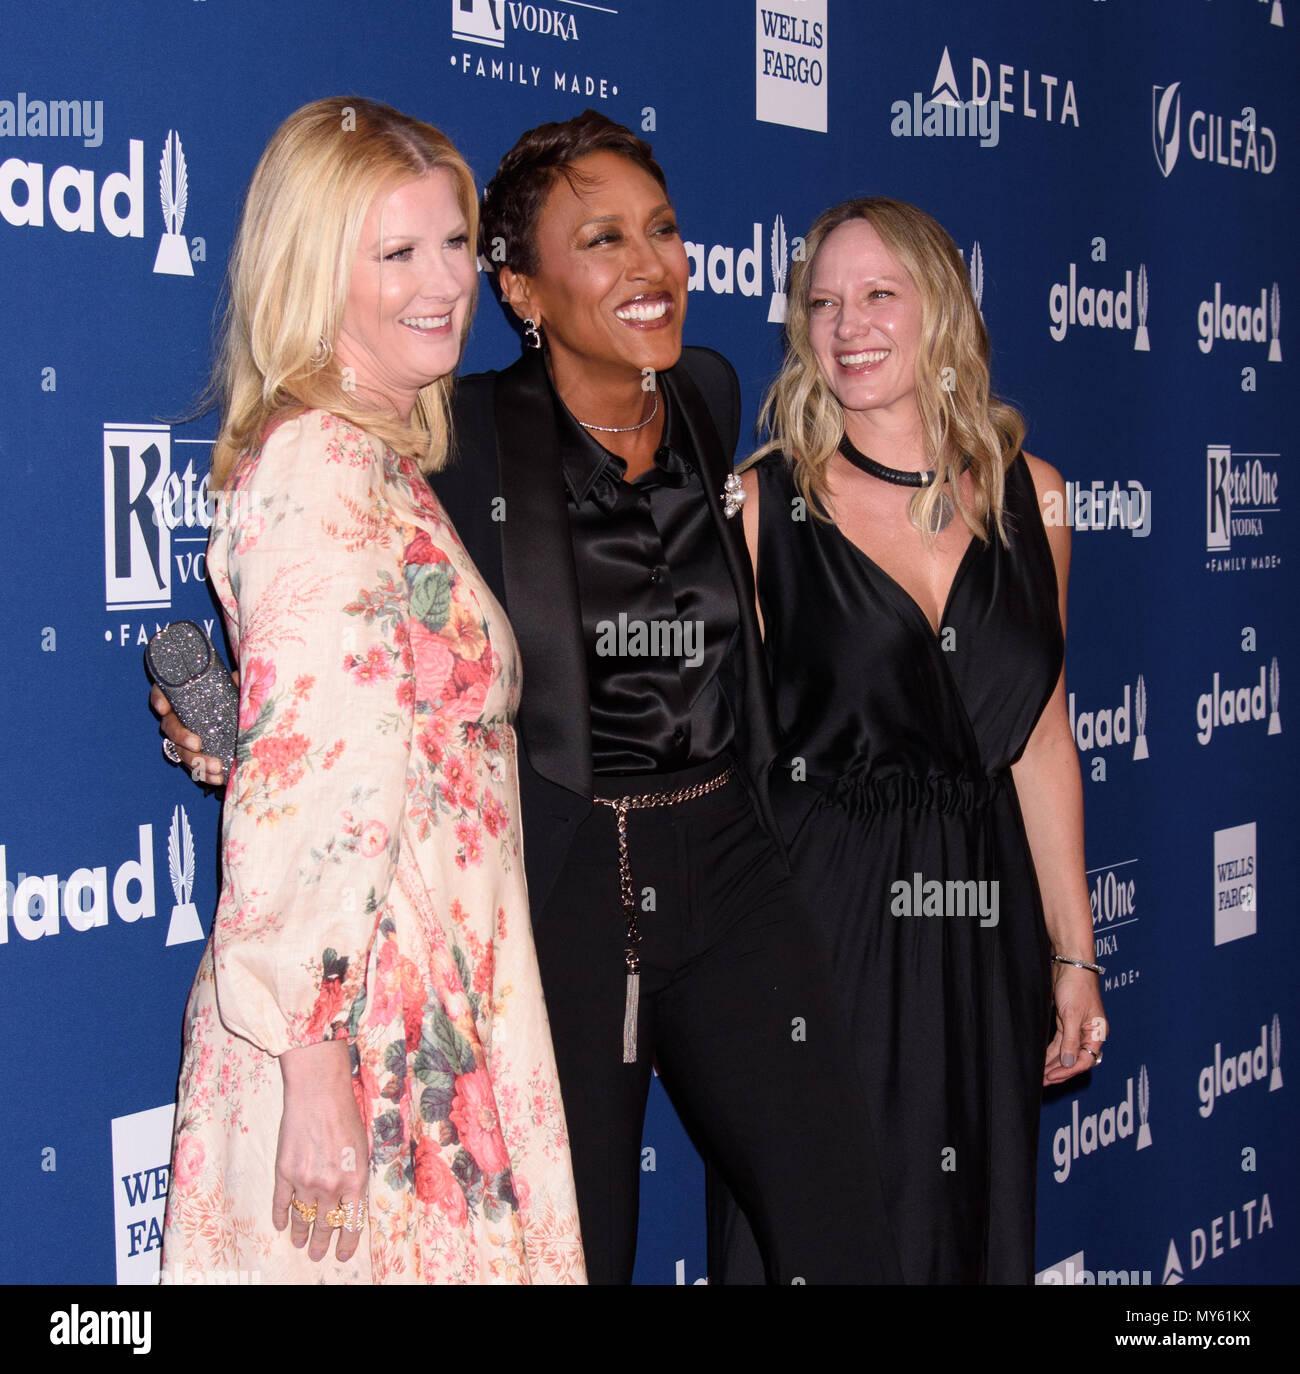 29 Jahrliche Glaad Media Awards Mit Sandra Lee Robin Roberts Amber Laign Wo New York New York United States Wenn 06 Mai 2018 Credit Wenn Com Stockfotografie Alamy